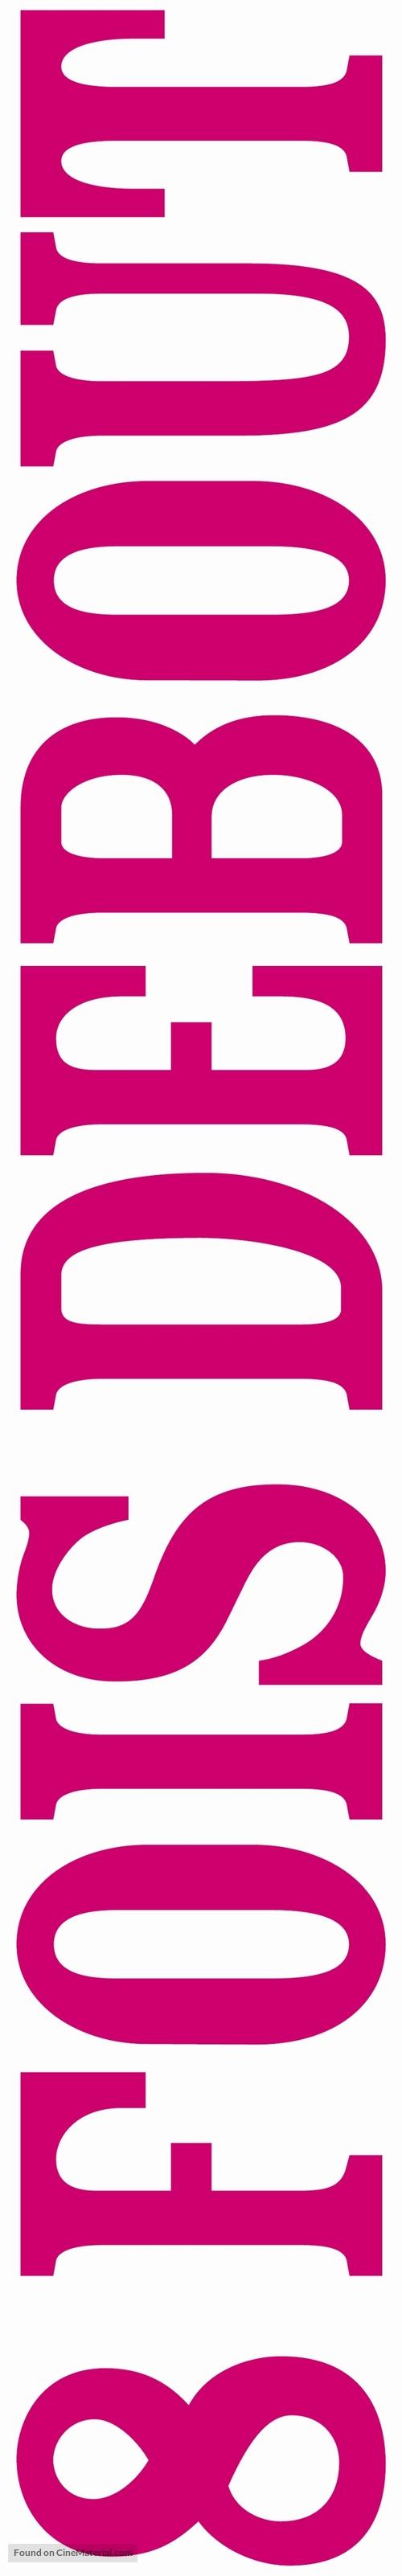 Huit fois debout - French Logo